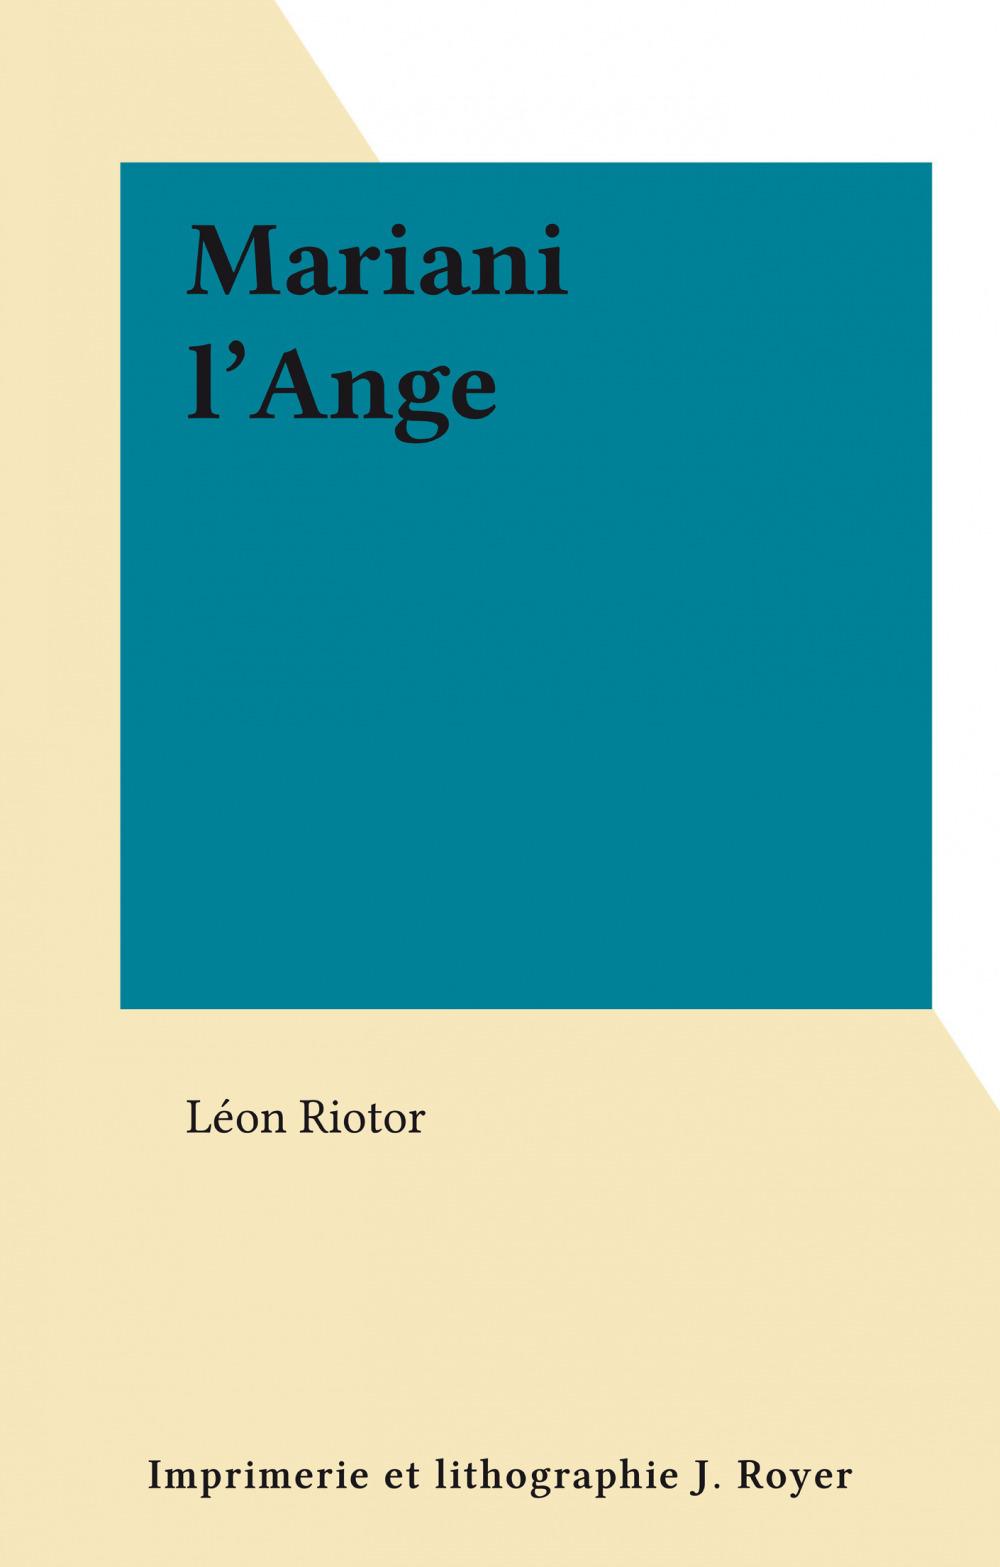 Mariani l'Ange  - Léon Riotor